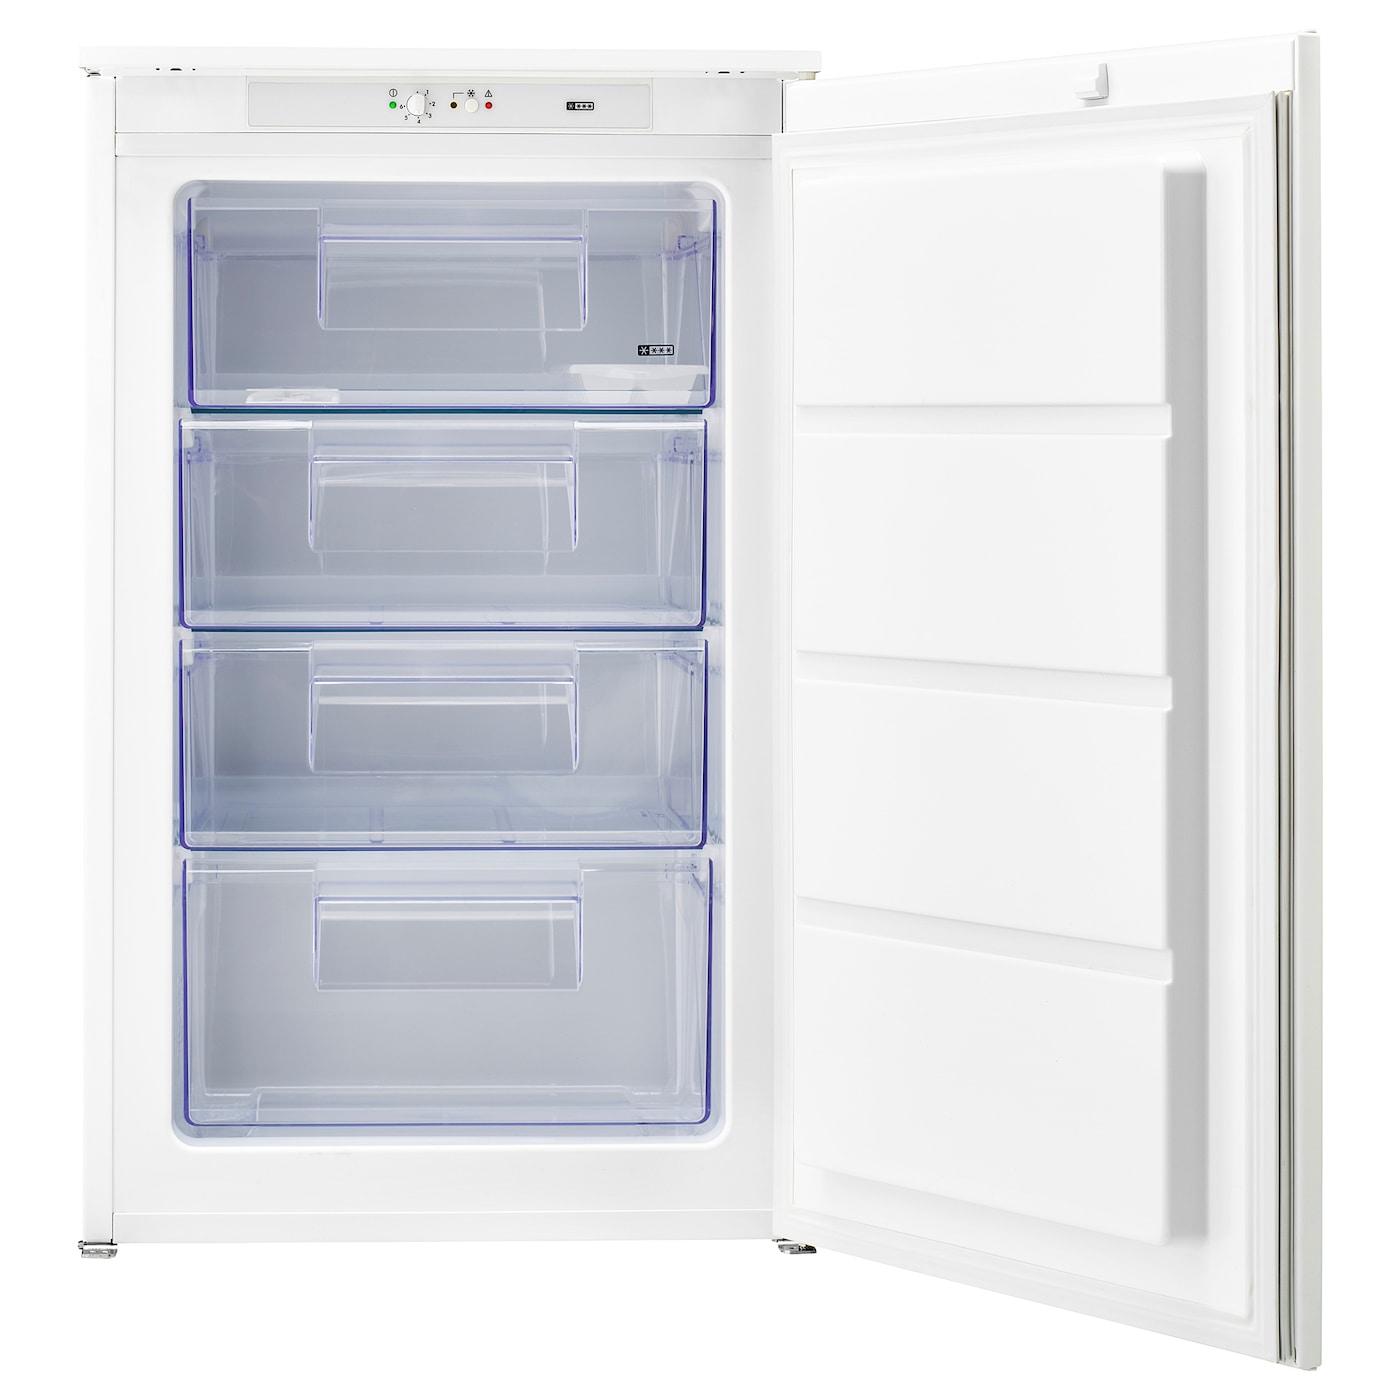 DJUPFRYSA Congelador integrado A++ blanco 98 l